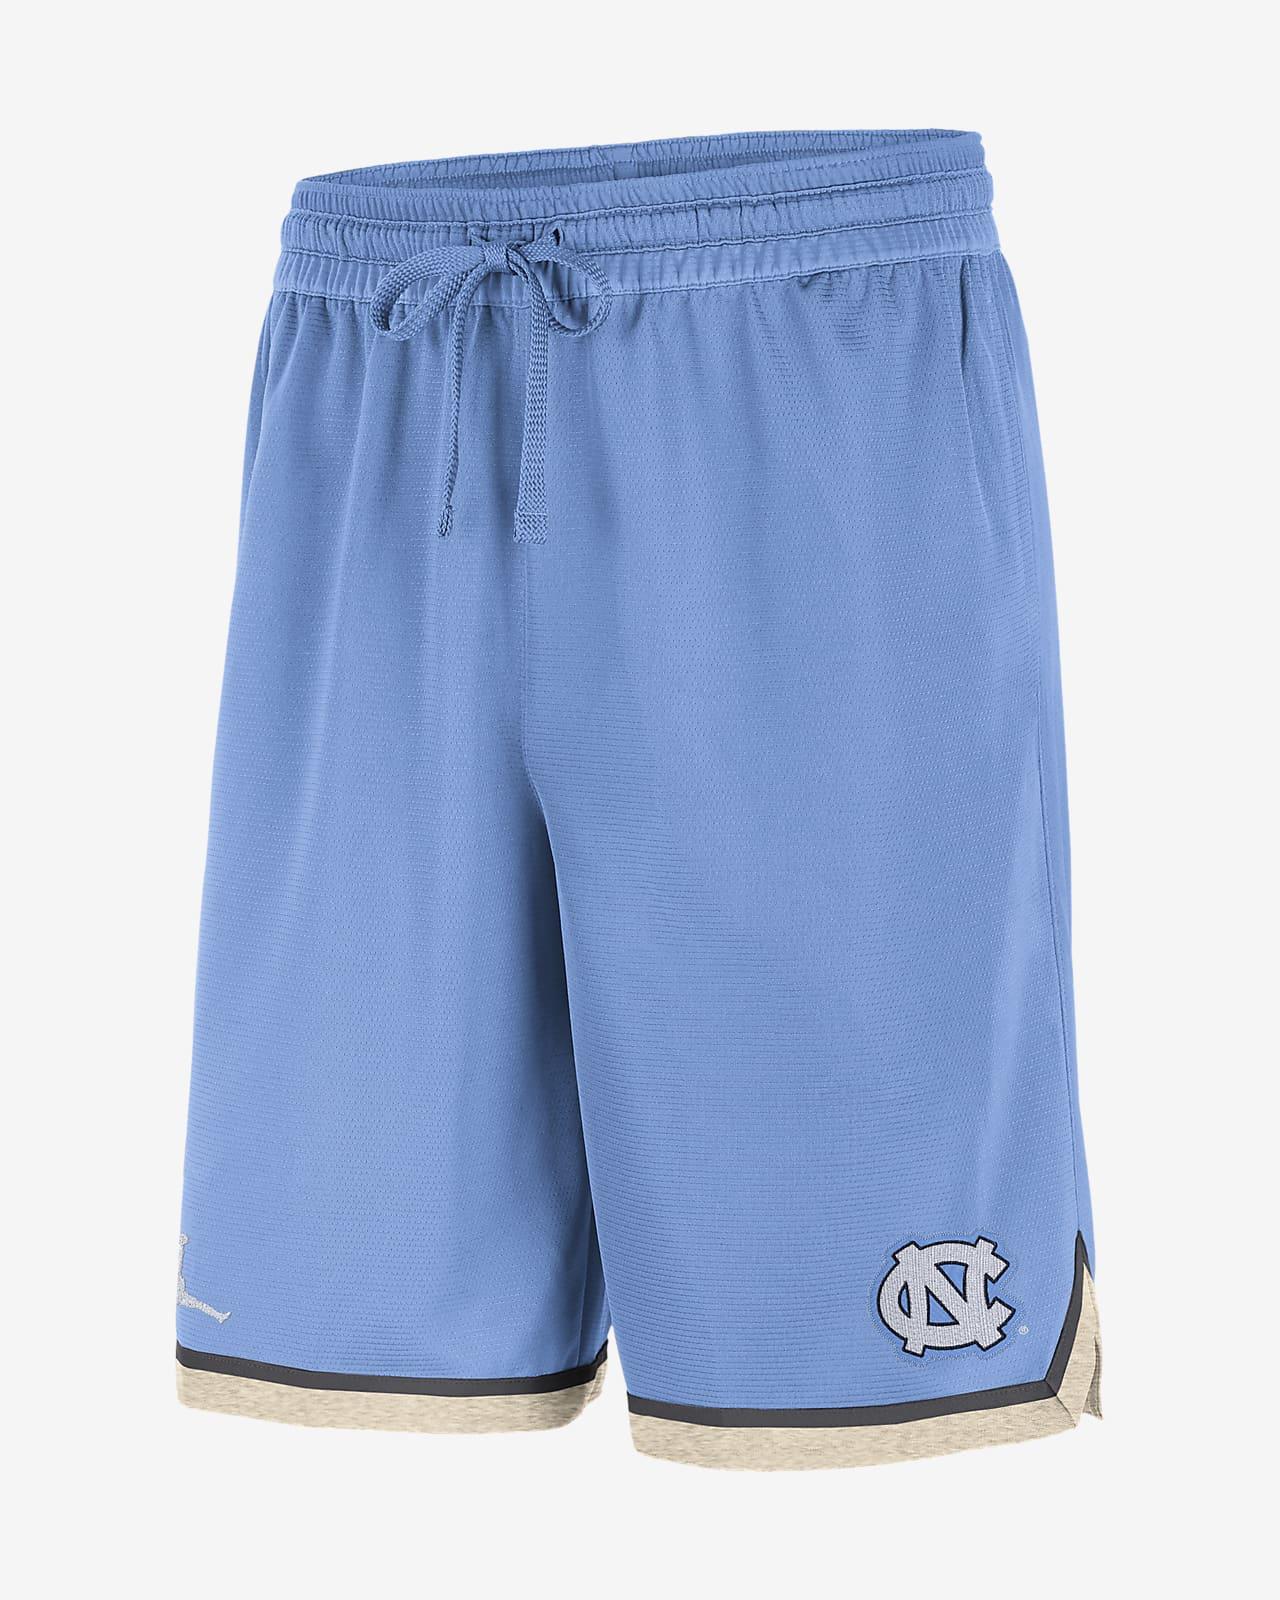 Jordan College DNA (UNC) Men's Shorts